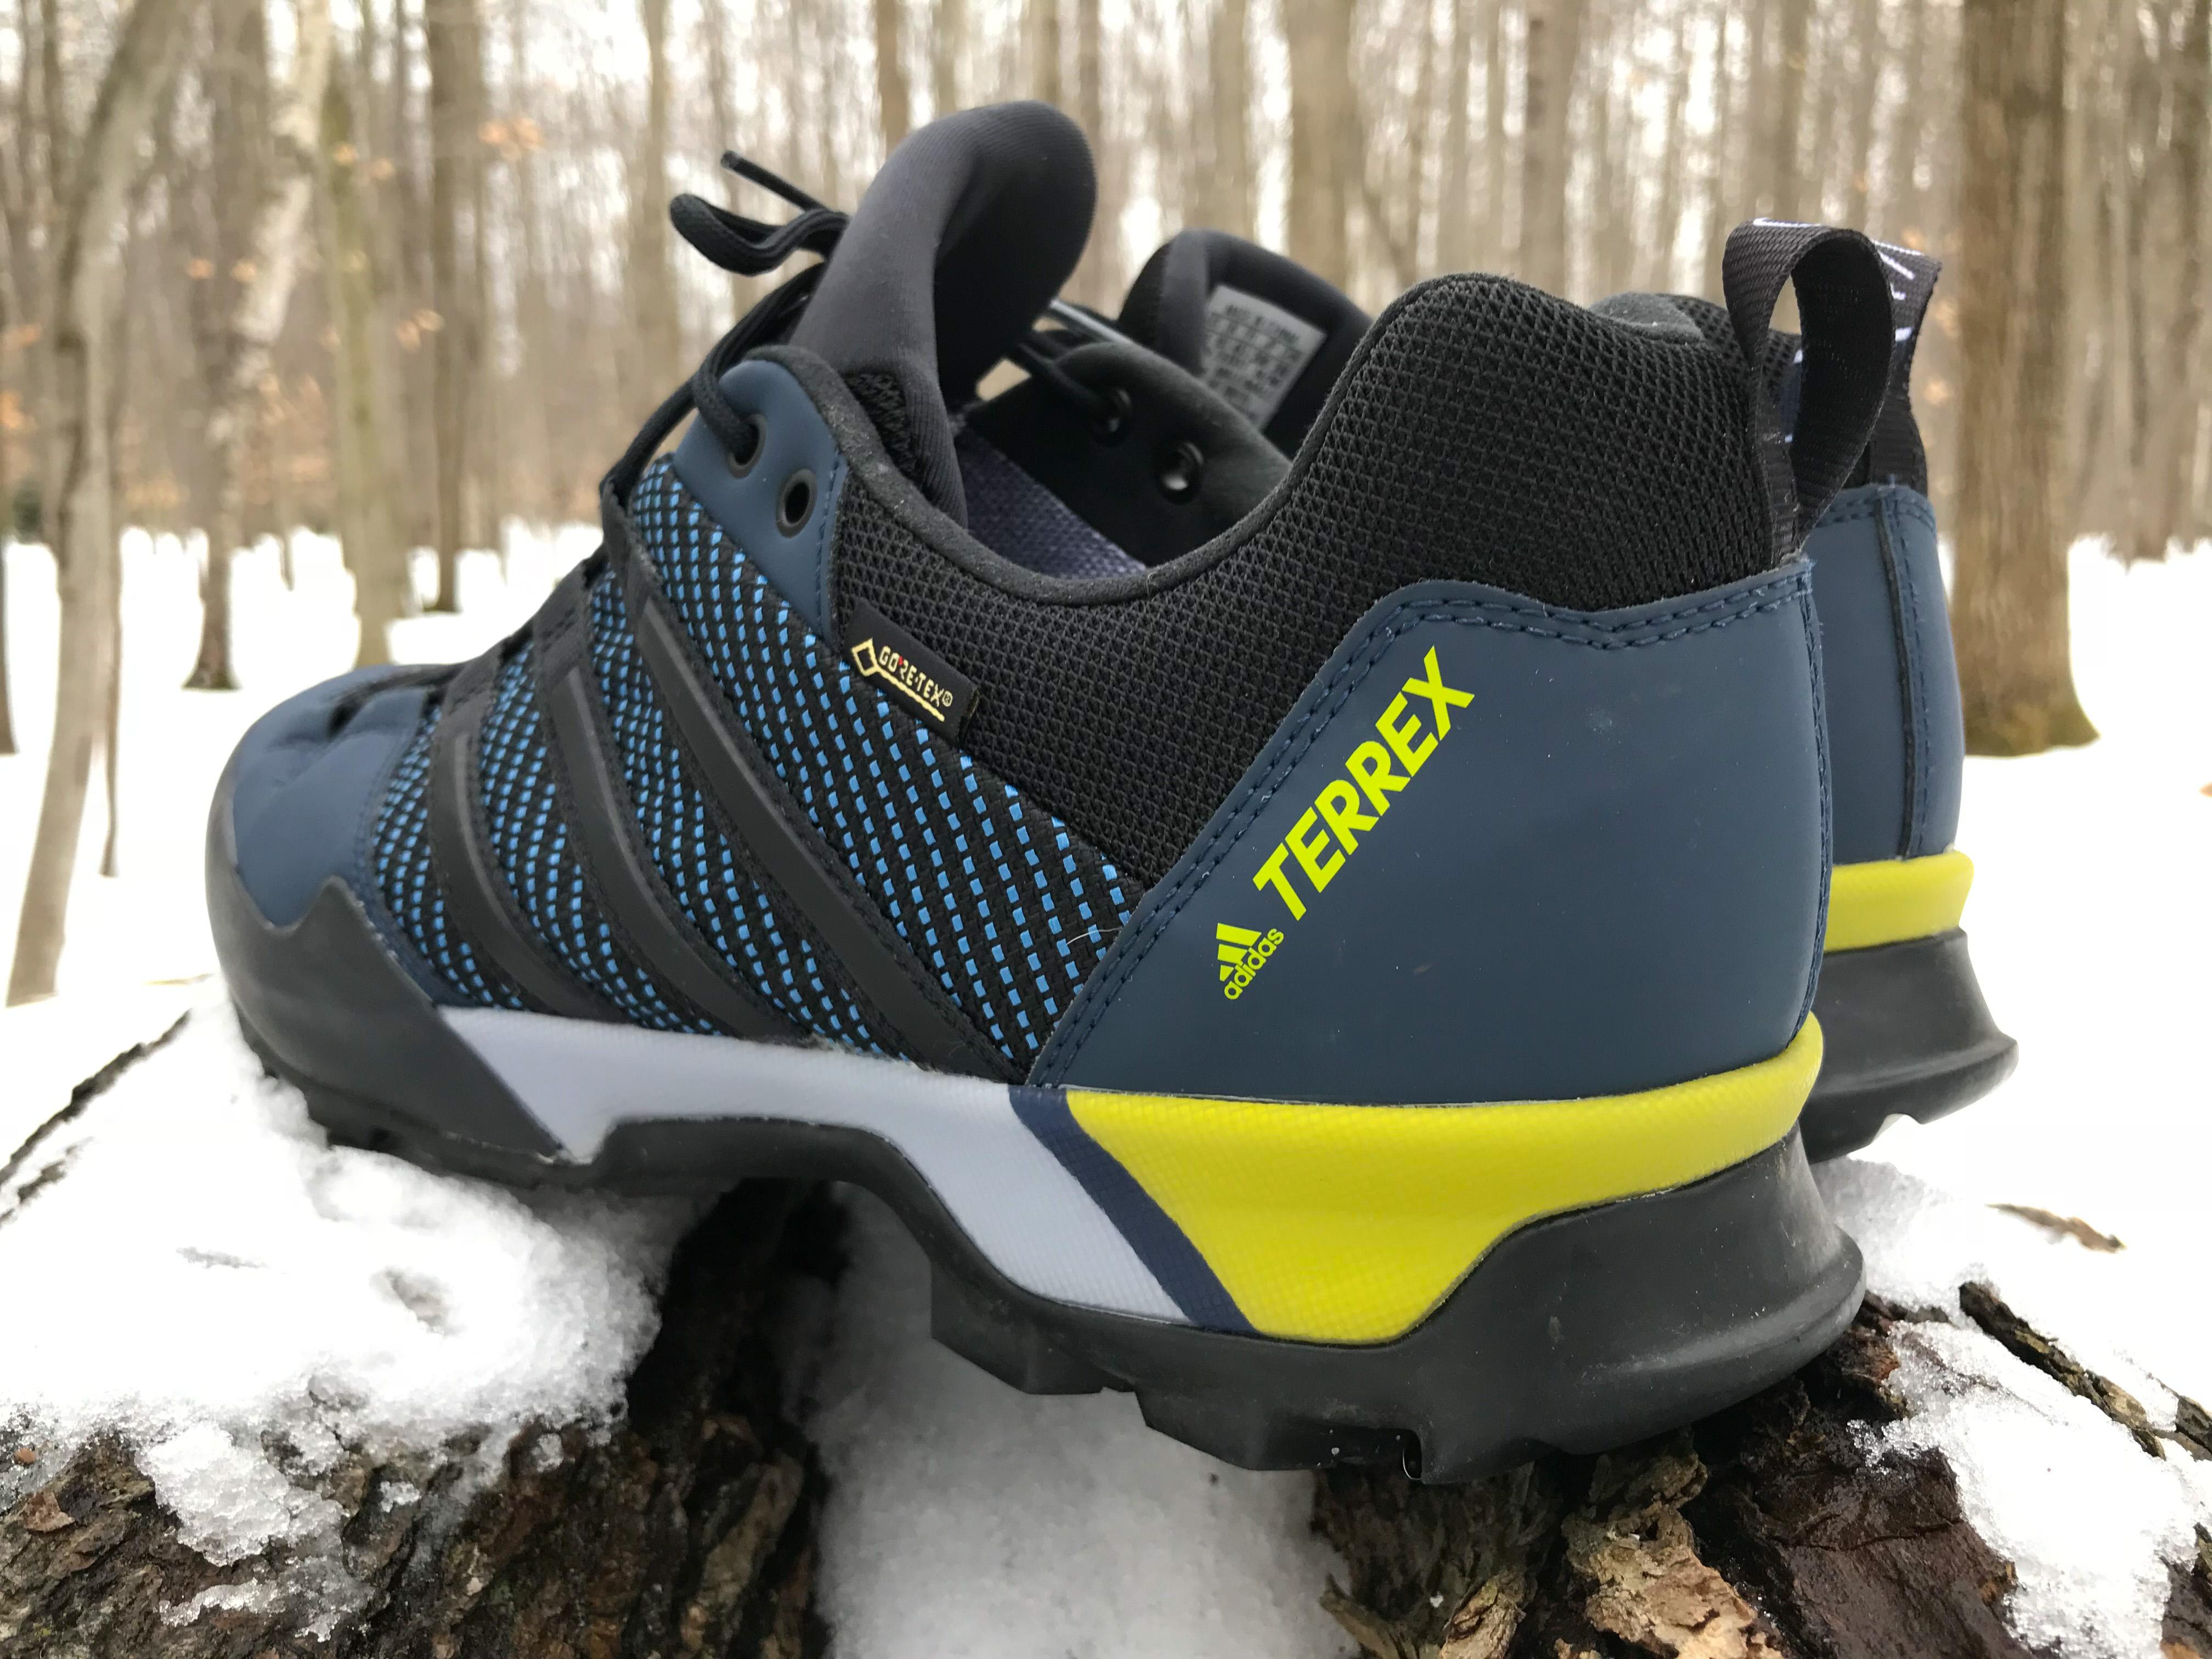 Adidas Terrex Scope GTX: Waterproof climbing shoes   SOFREP